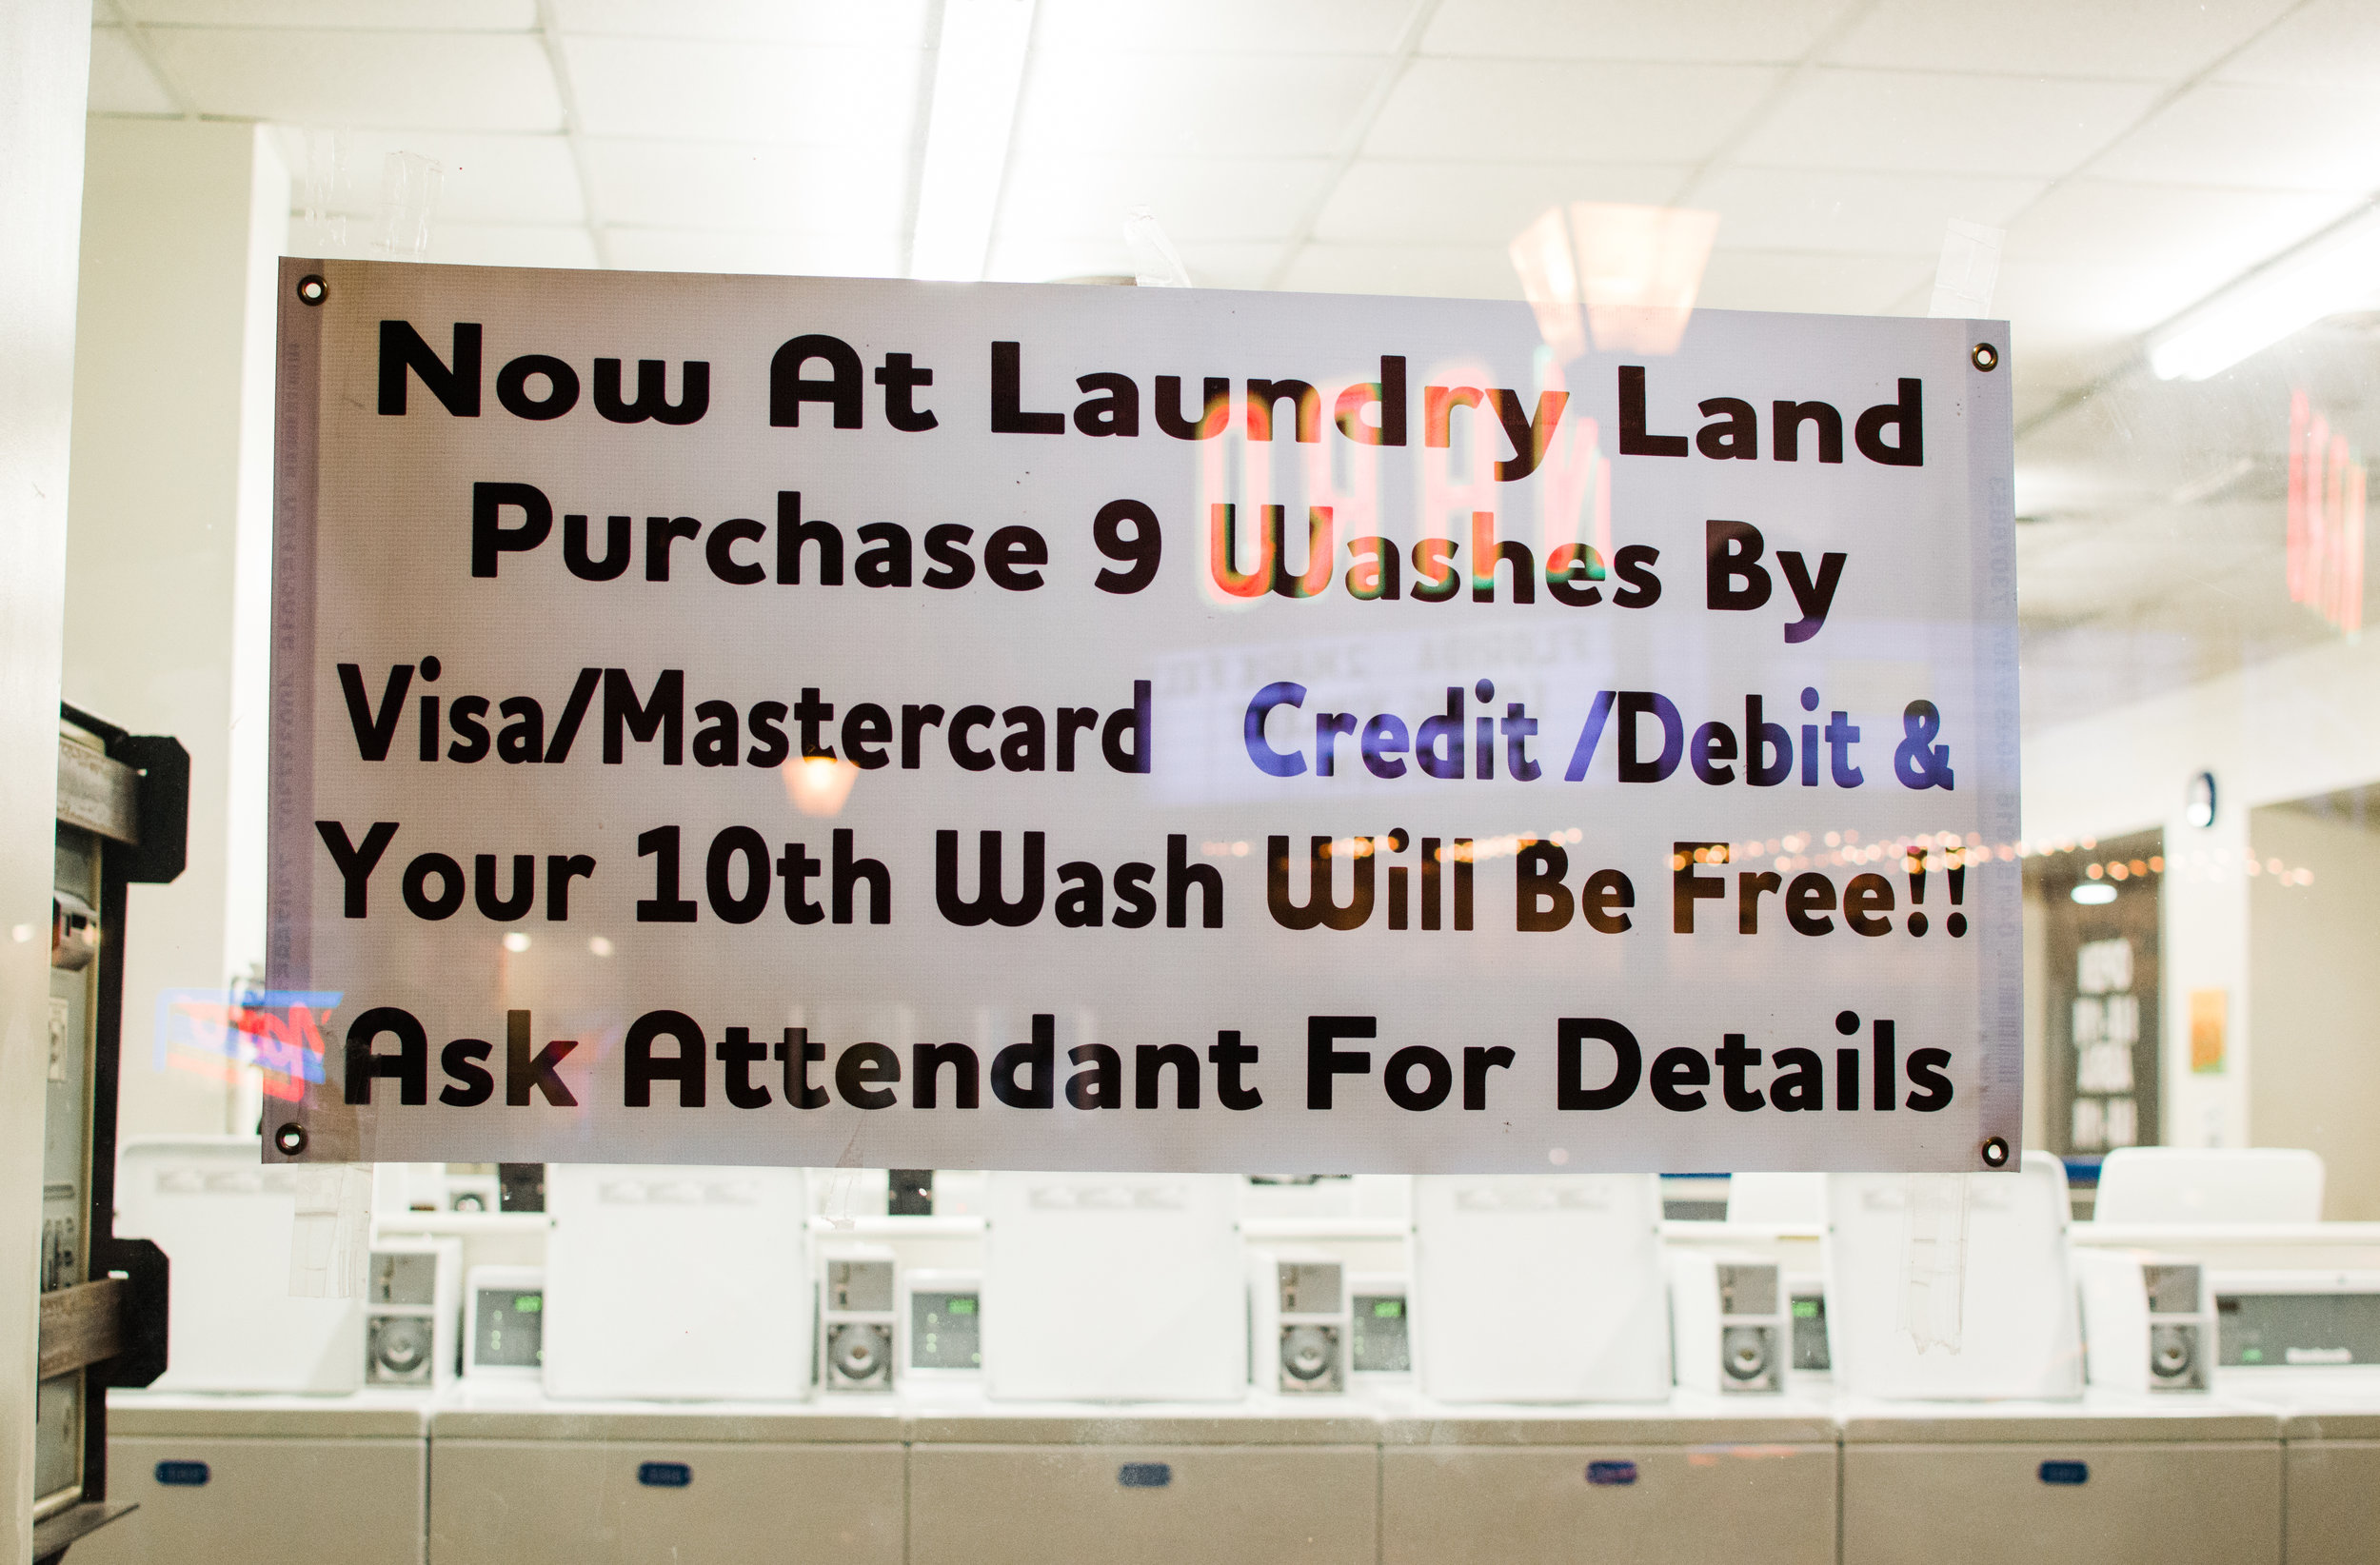 11/19/17 Laundry Land A. Fujicolor Pro 400H Pushed